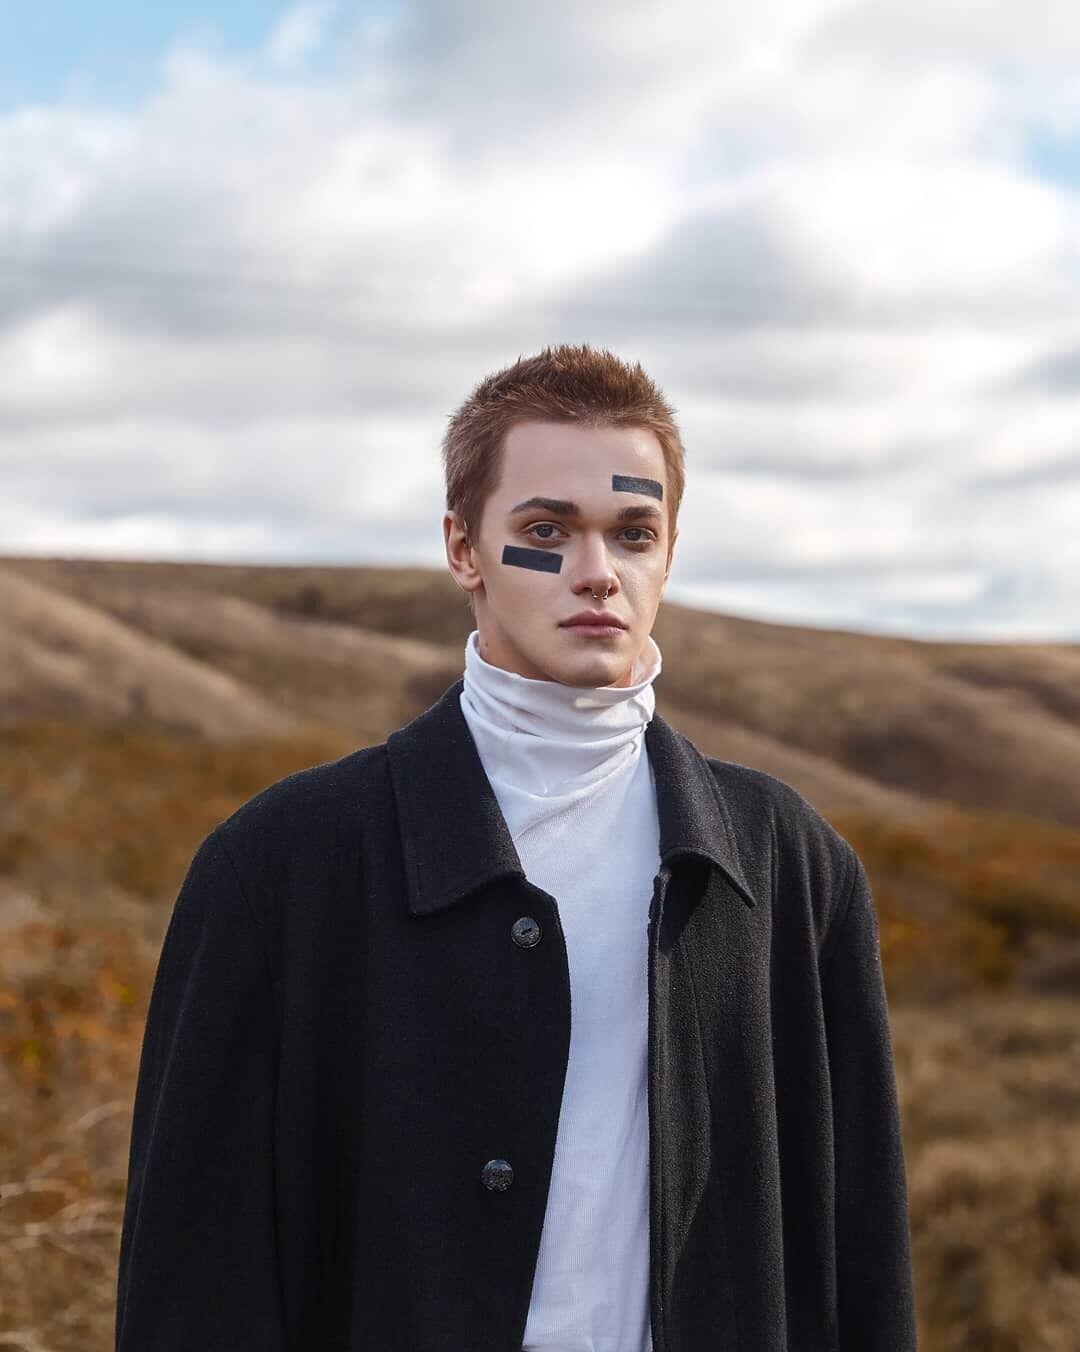 22-летний танцор Евгений Гончаренко